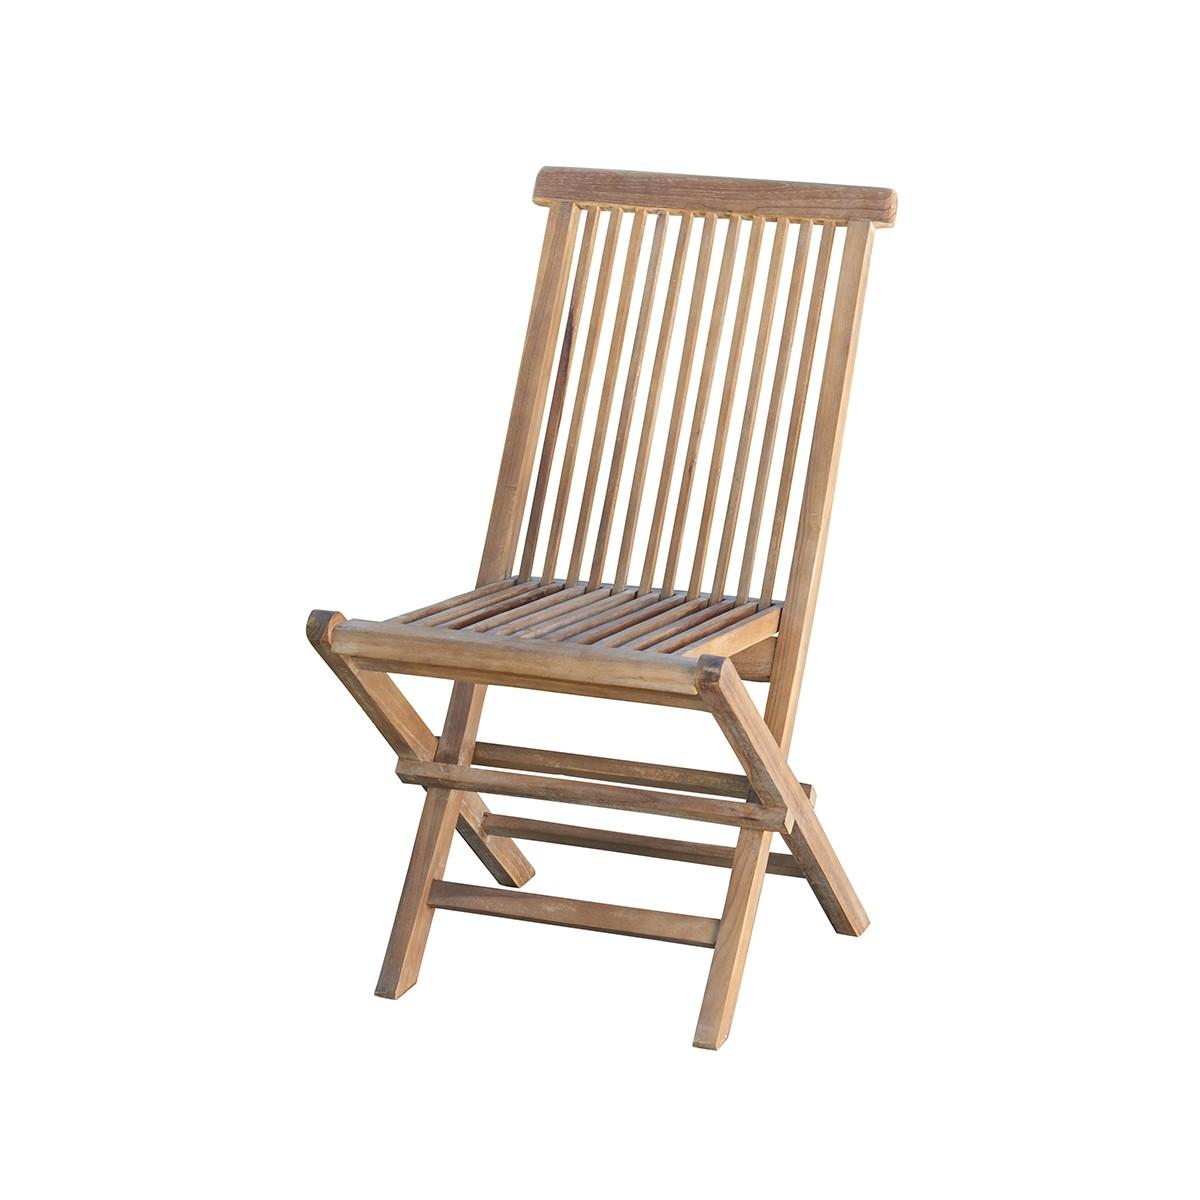 Chaise de jardin en teck huilé pliante